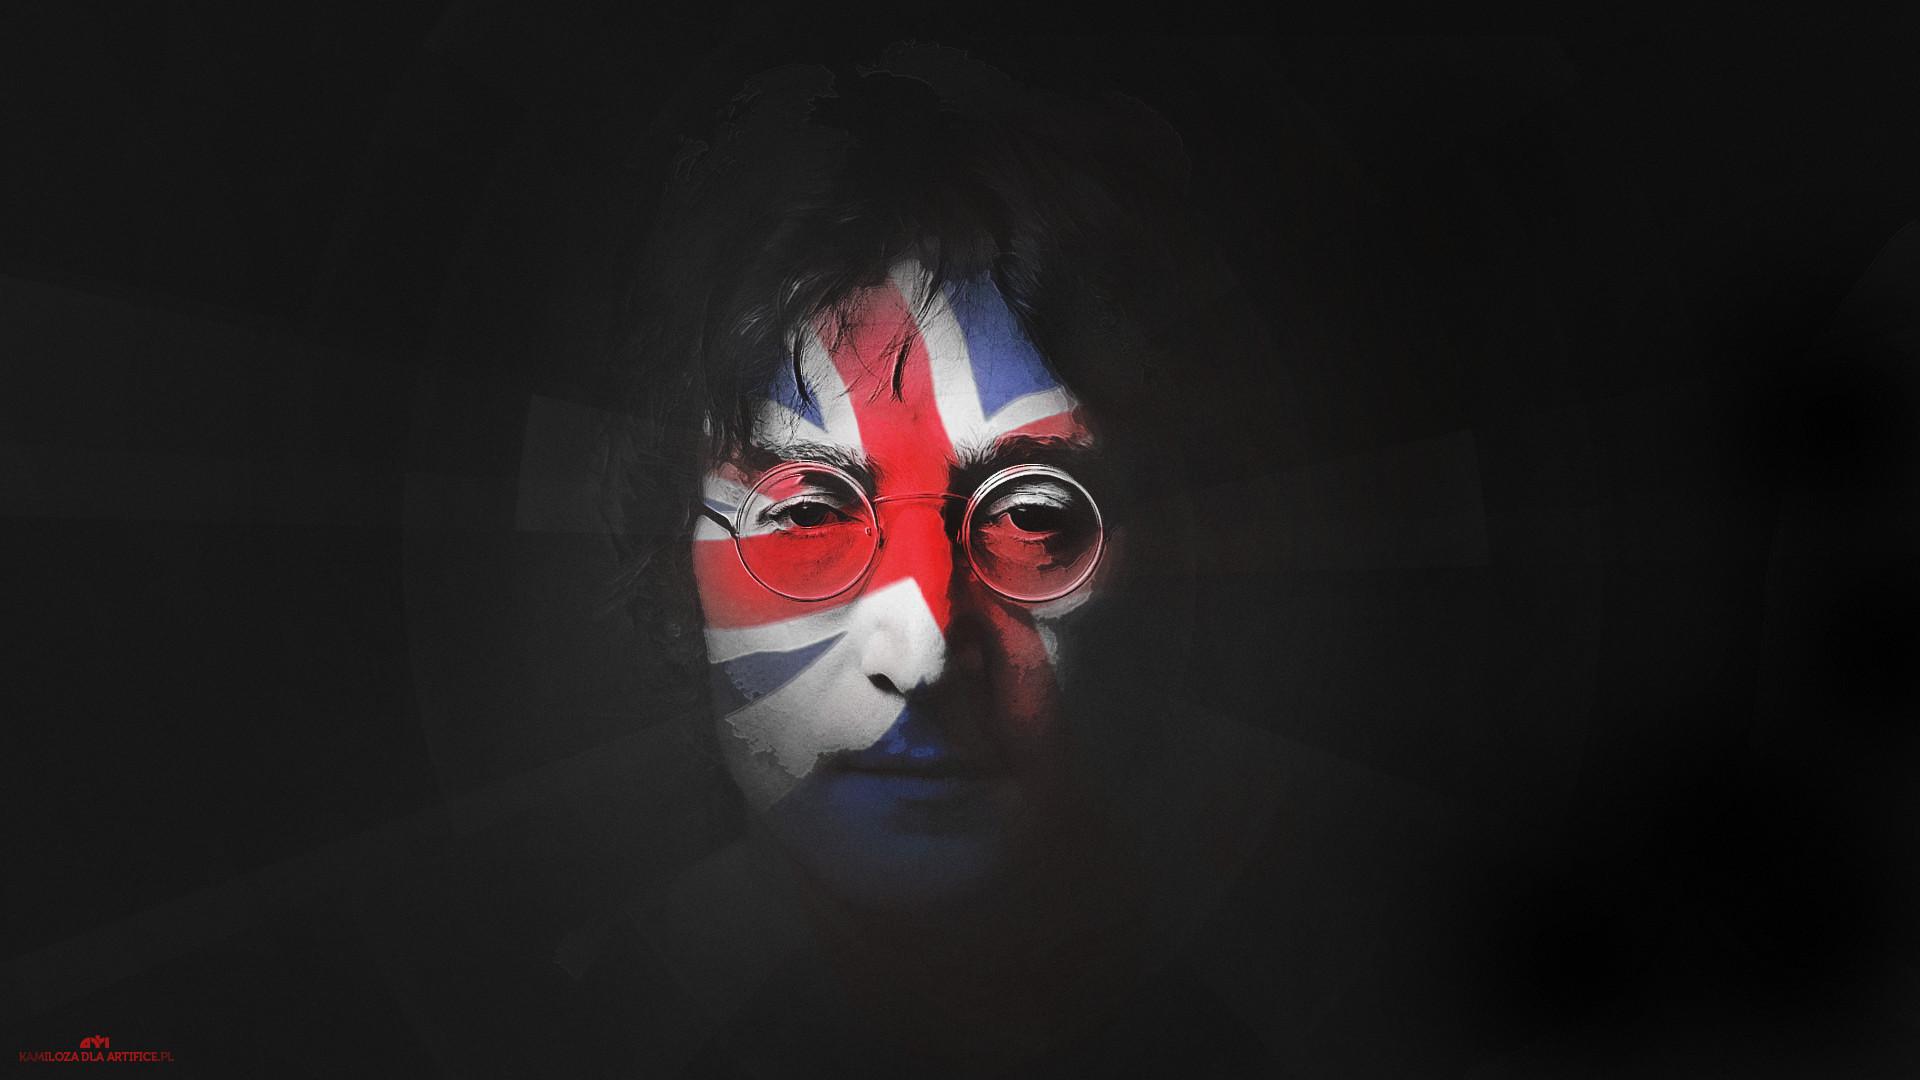 John Lennon by Kamiloza John Lennon by Kamiloza